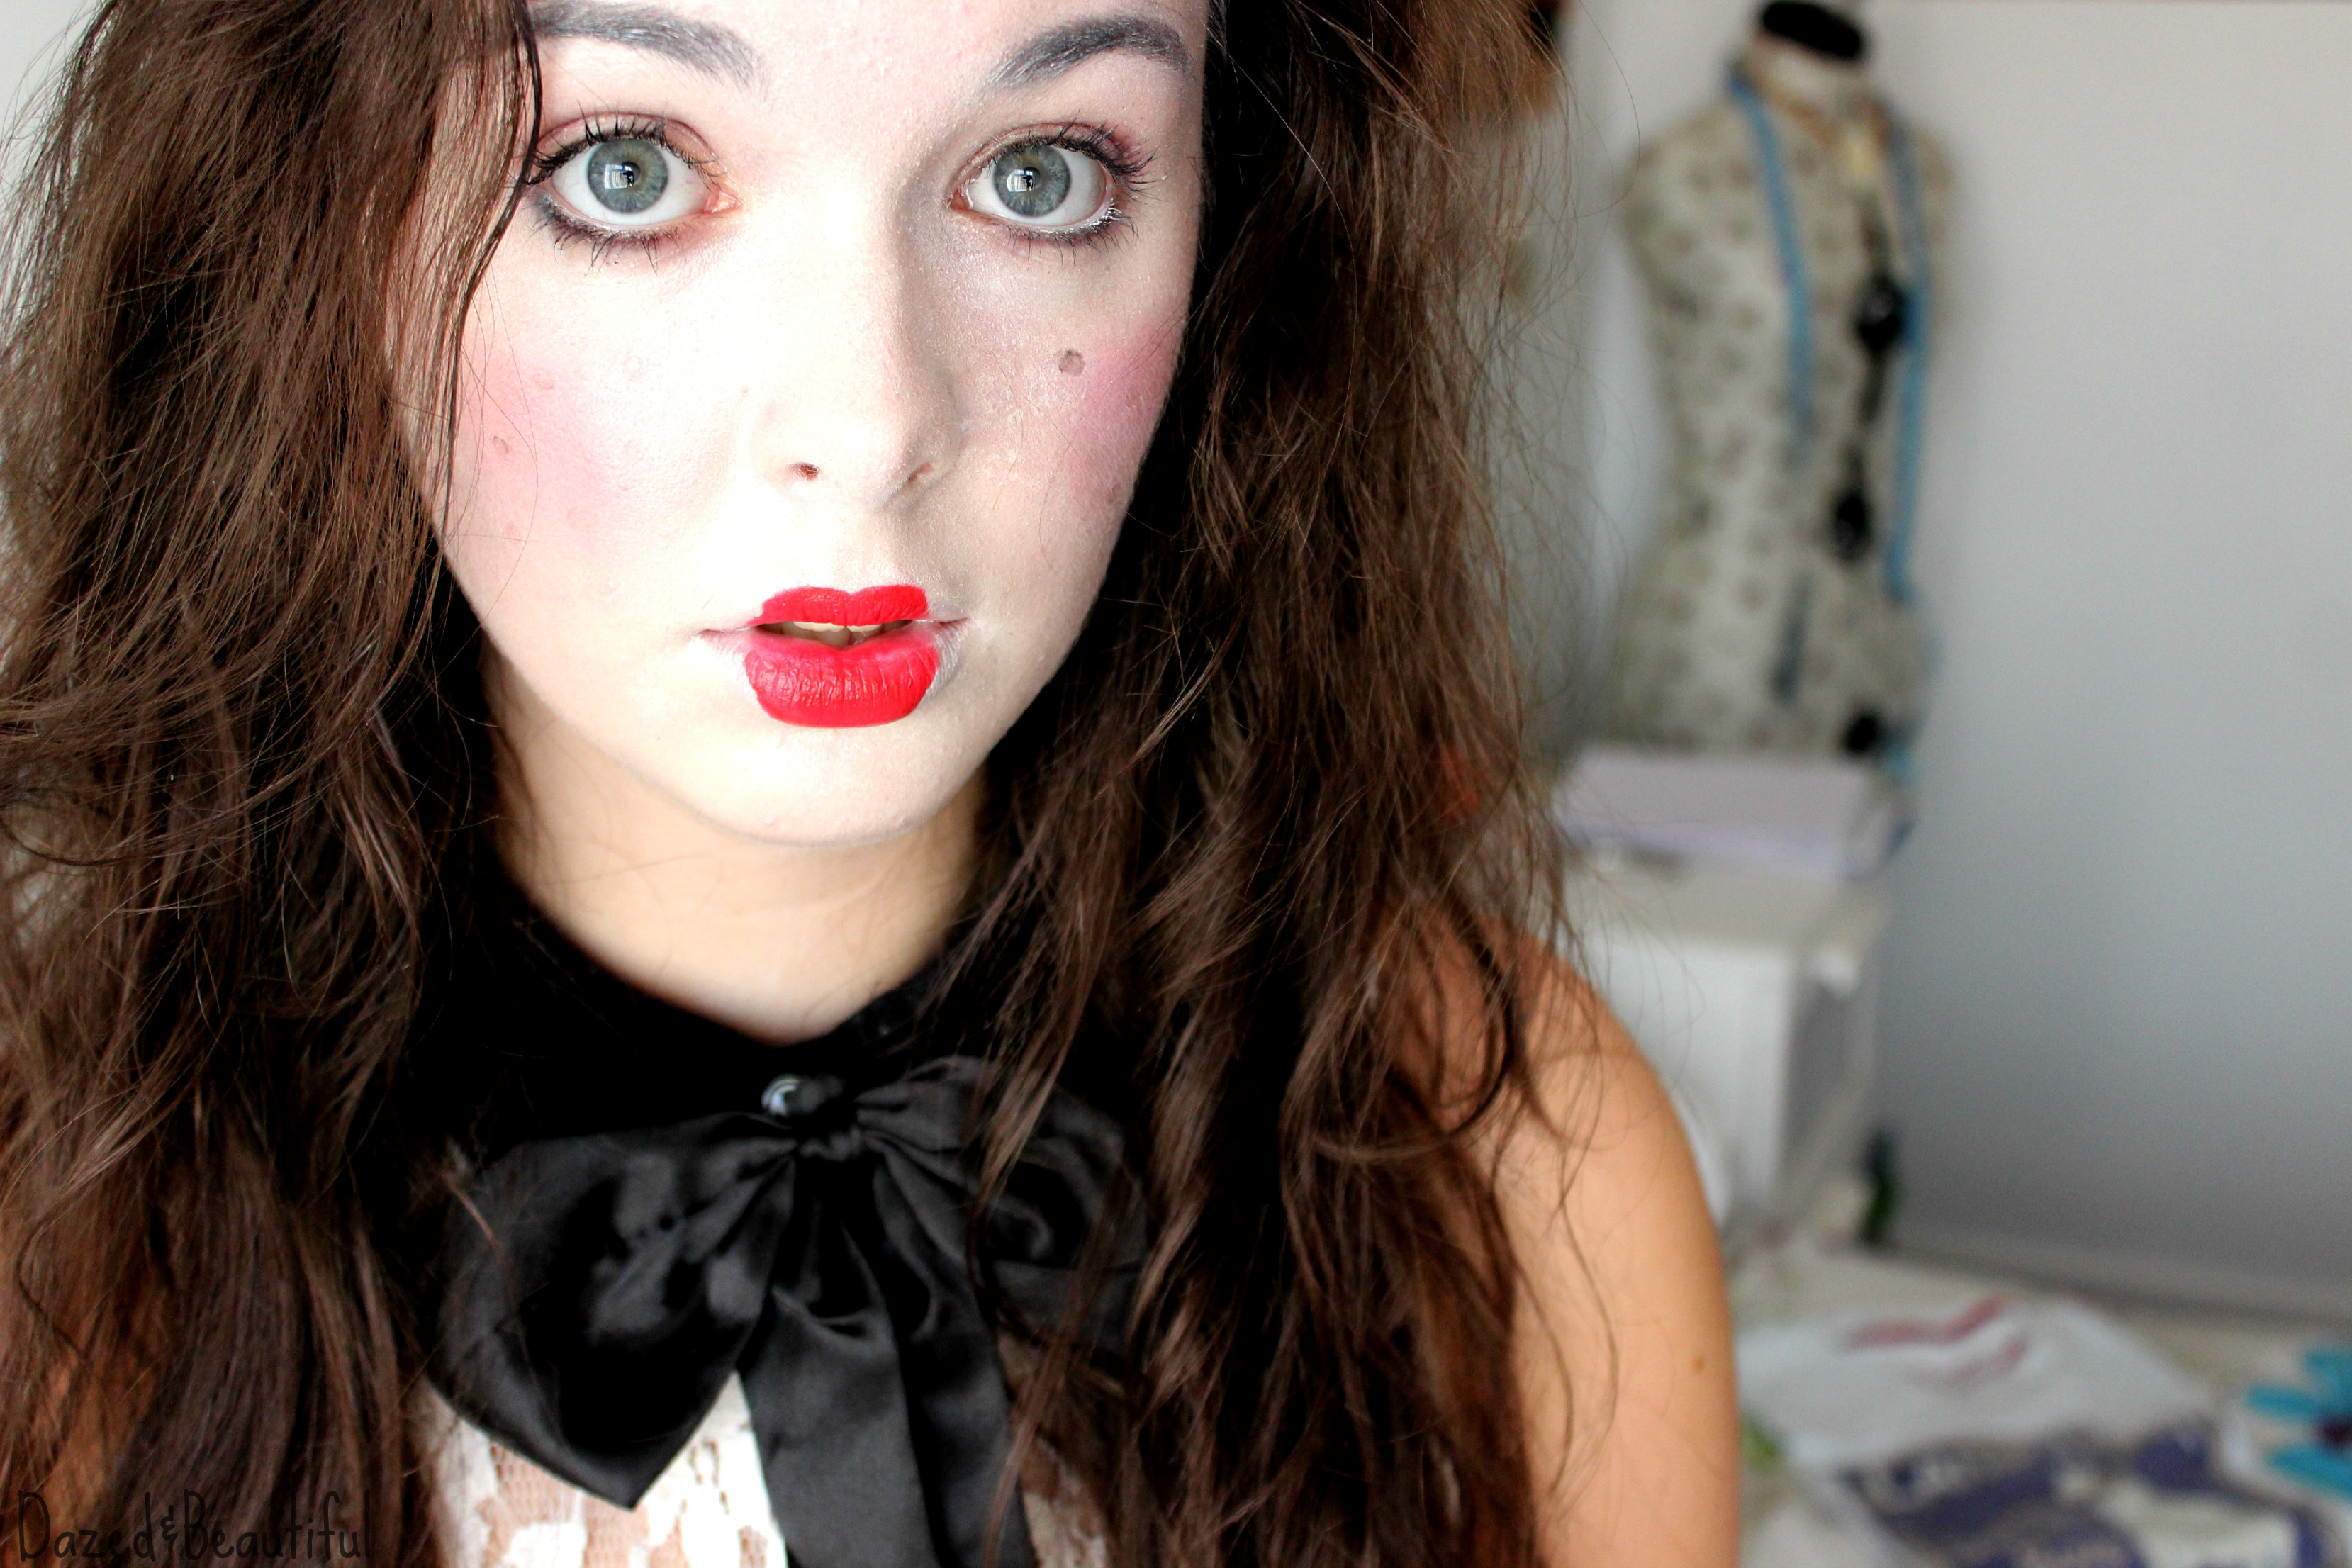 Maquillaje de Muequita de trapo para Halloween 2018 Vdeo